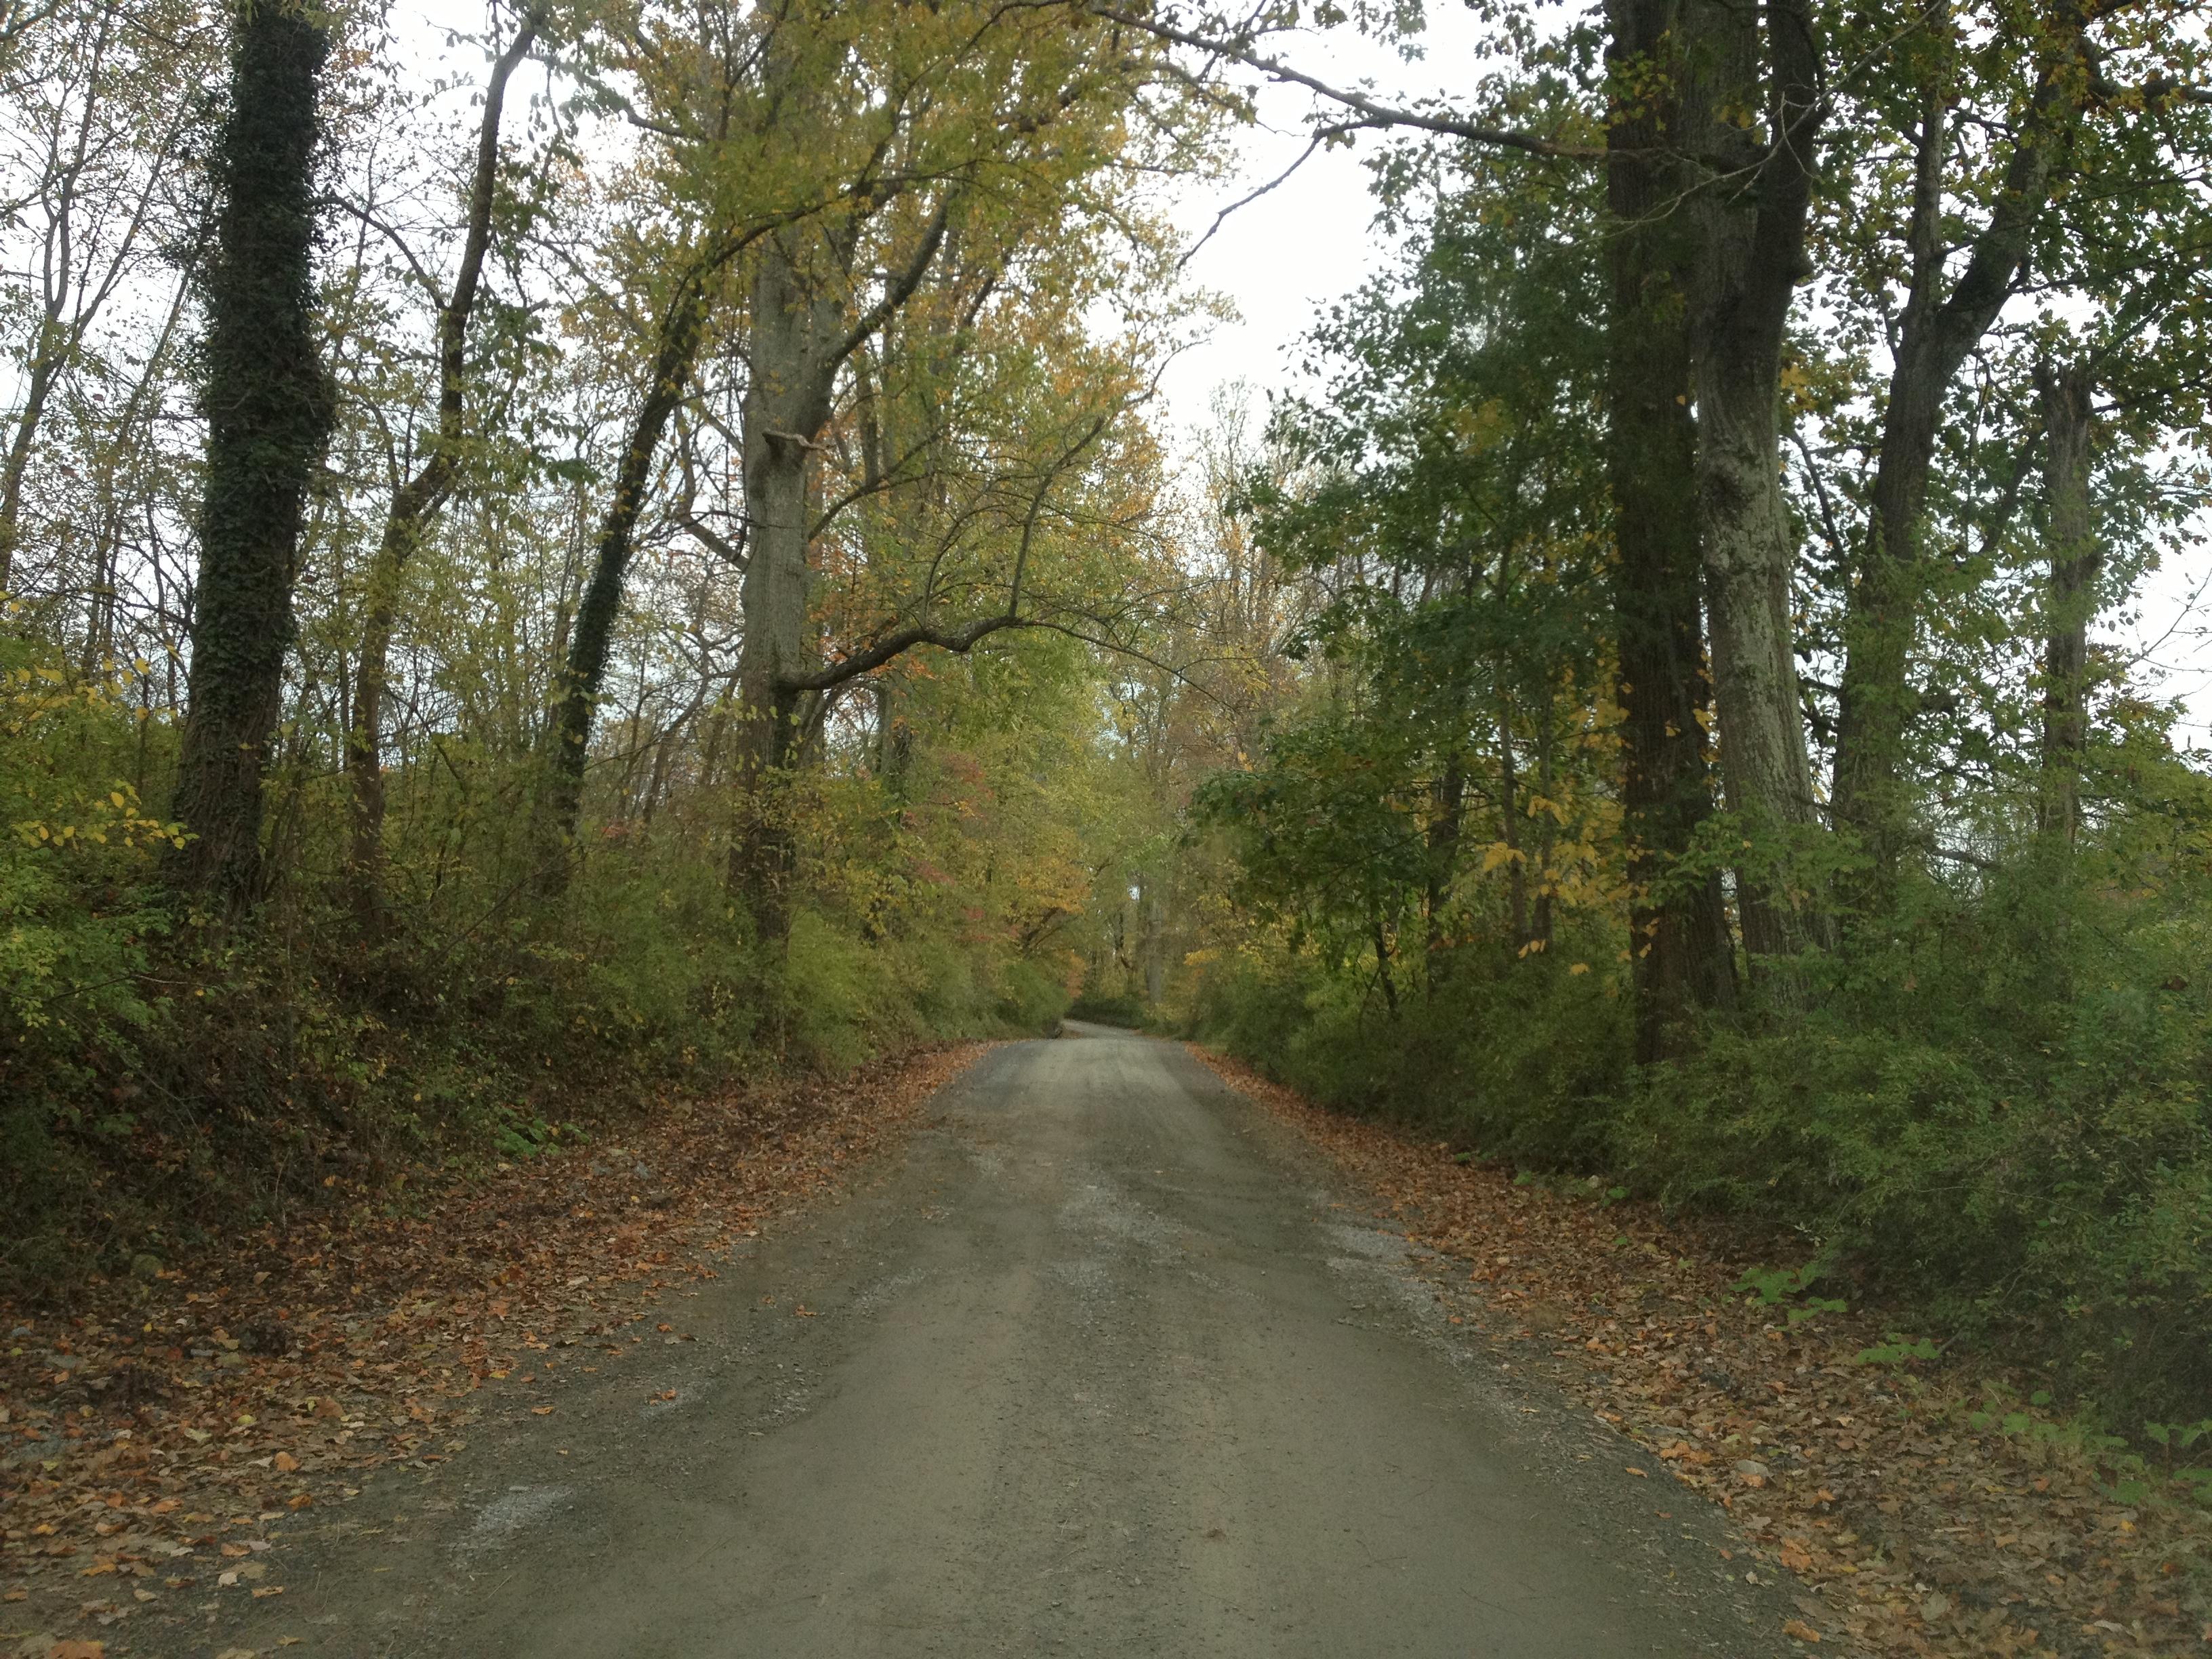 Rural_Roads.jpg